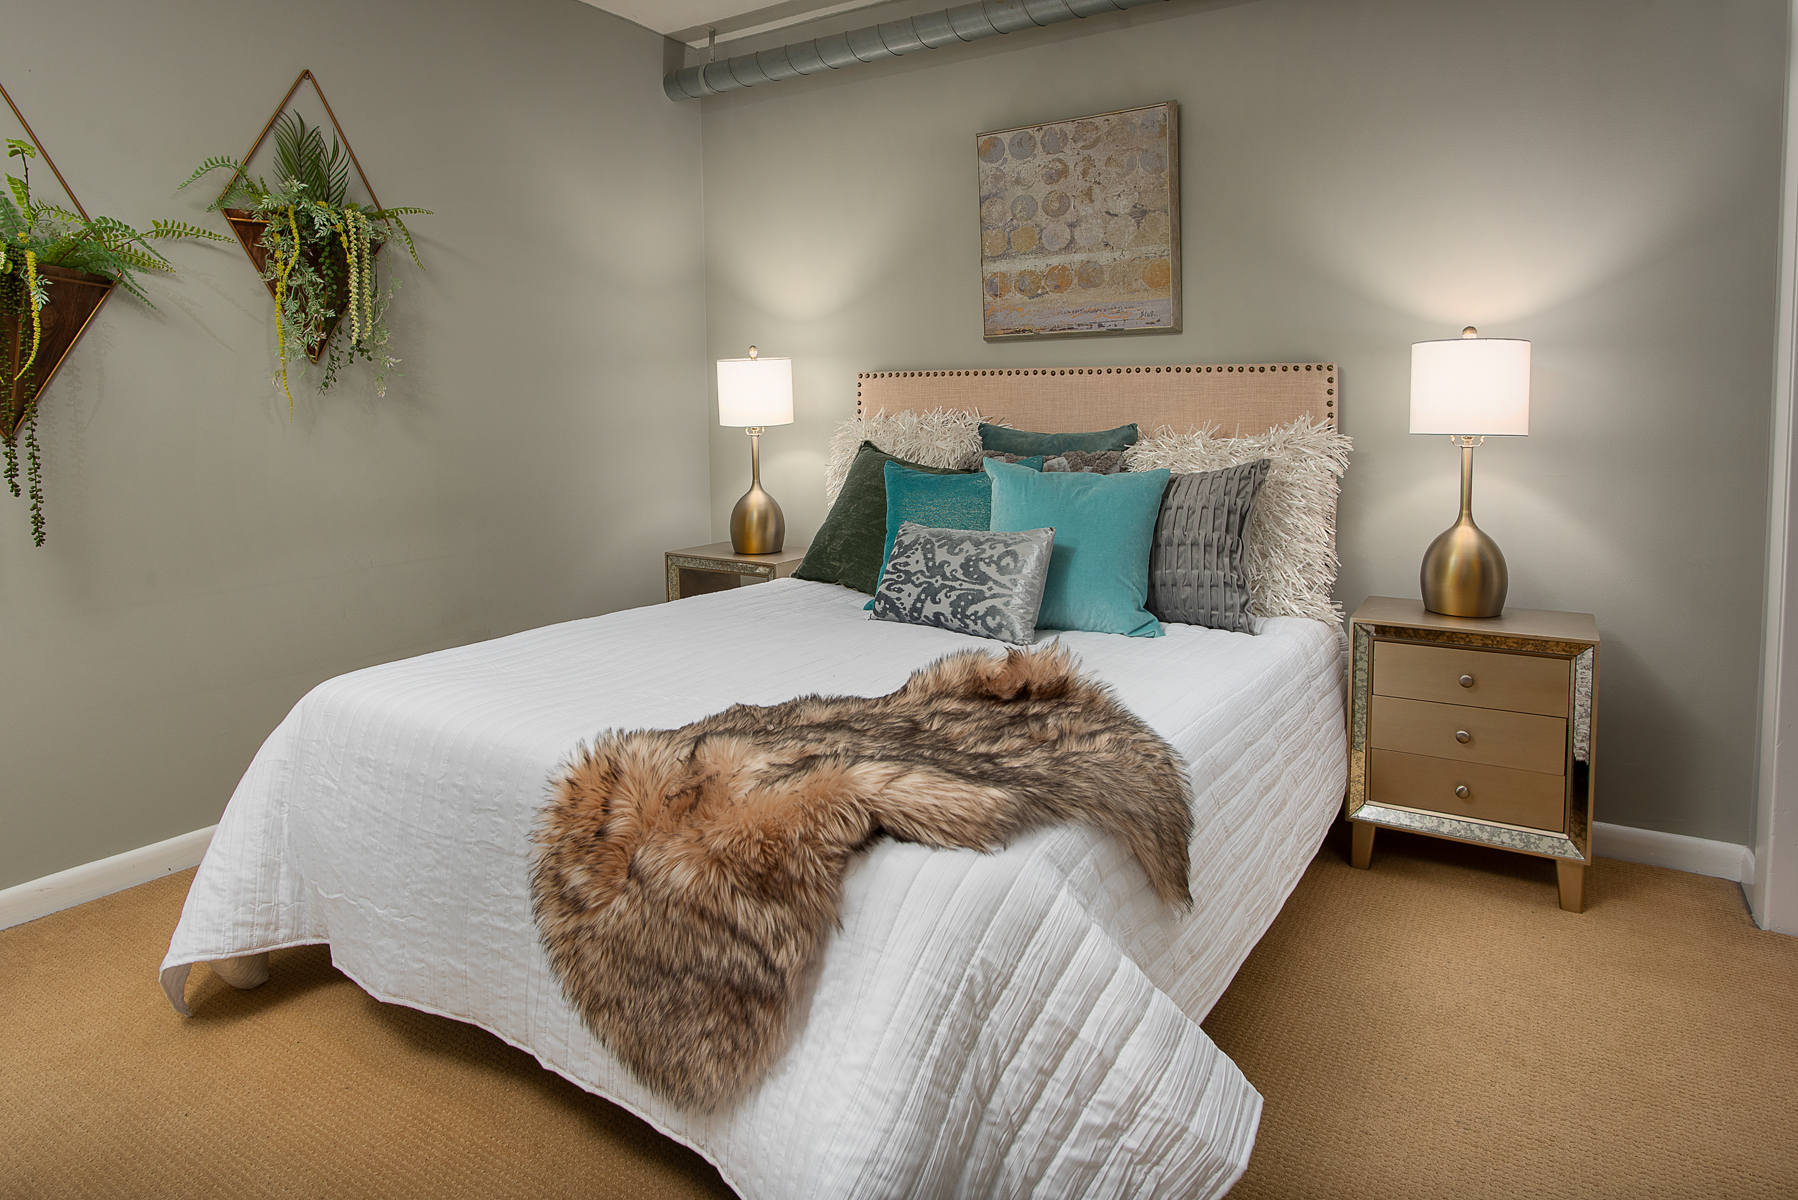 bedroom photo in washington dc